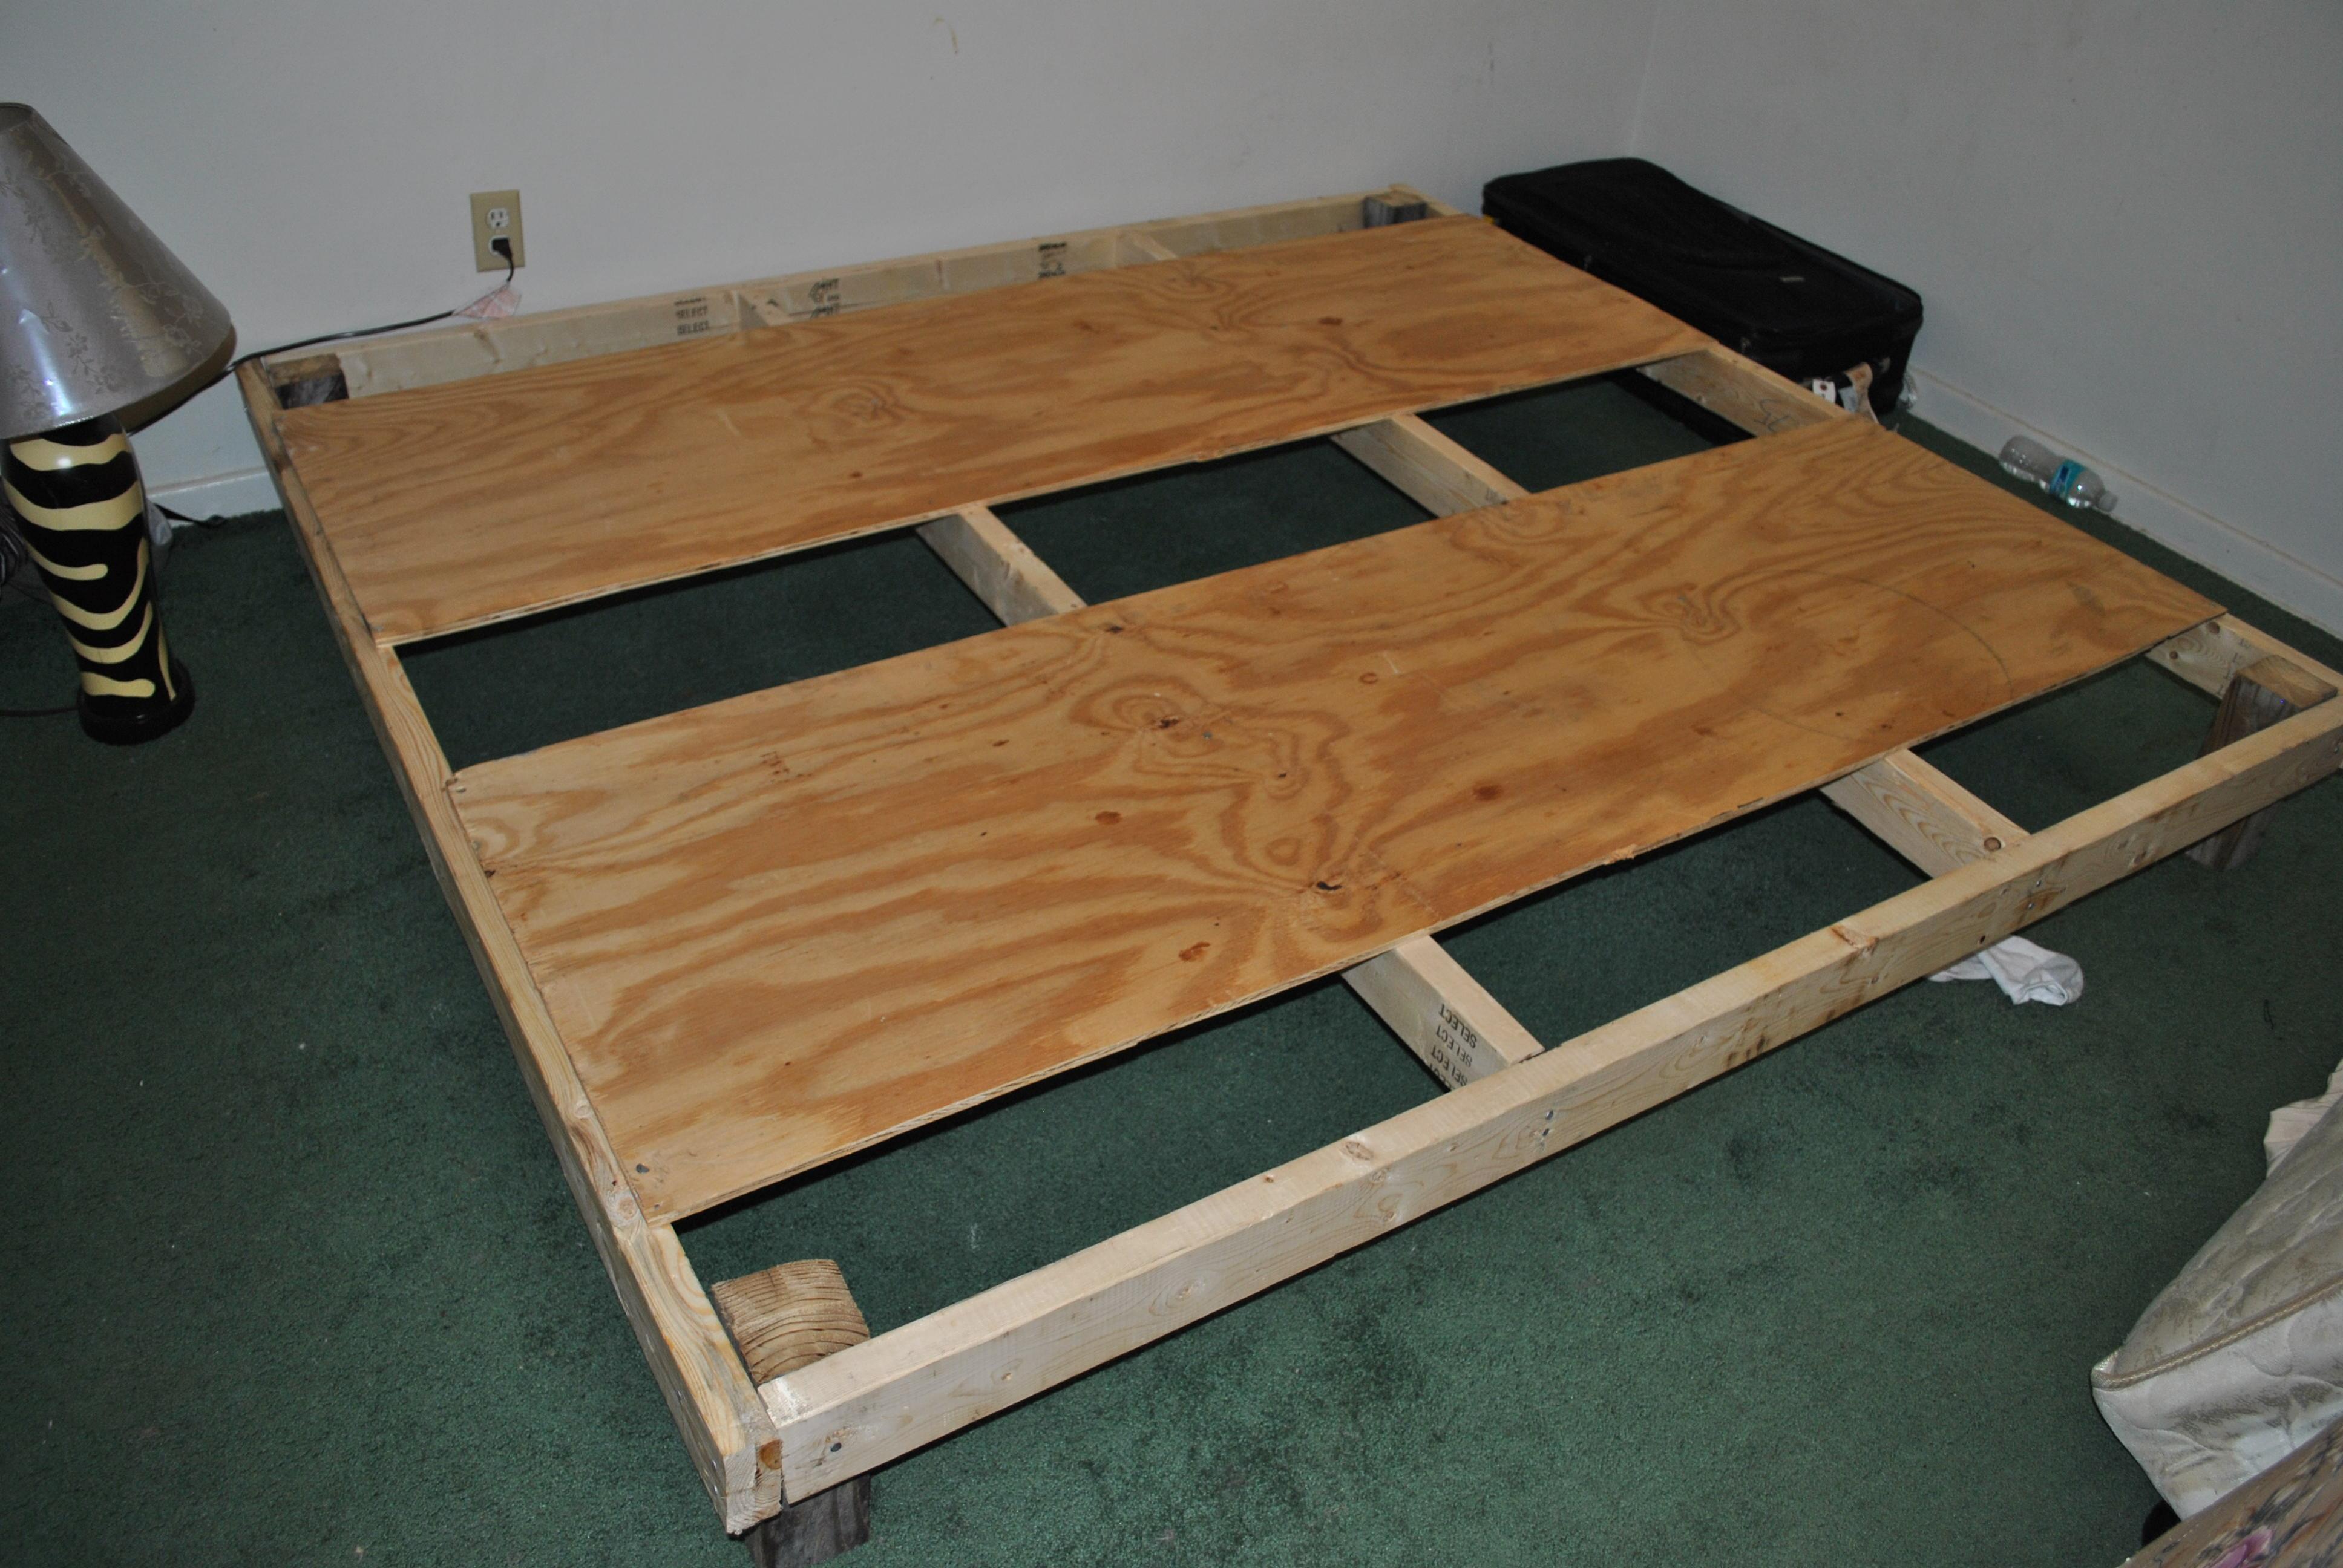 Diy Bed Frame For Less Than 30 6 Steps Instructables